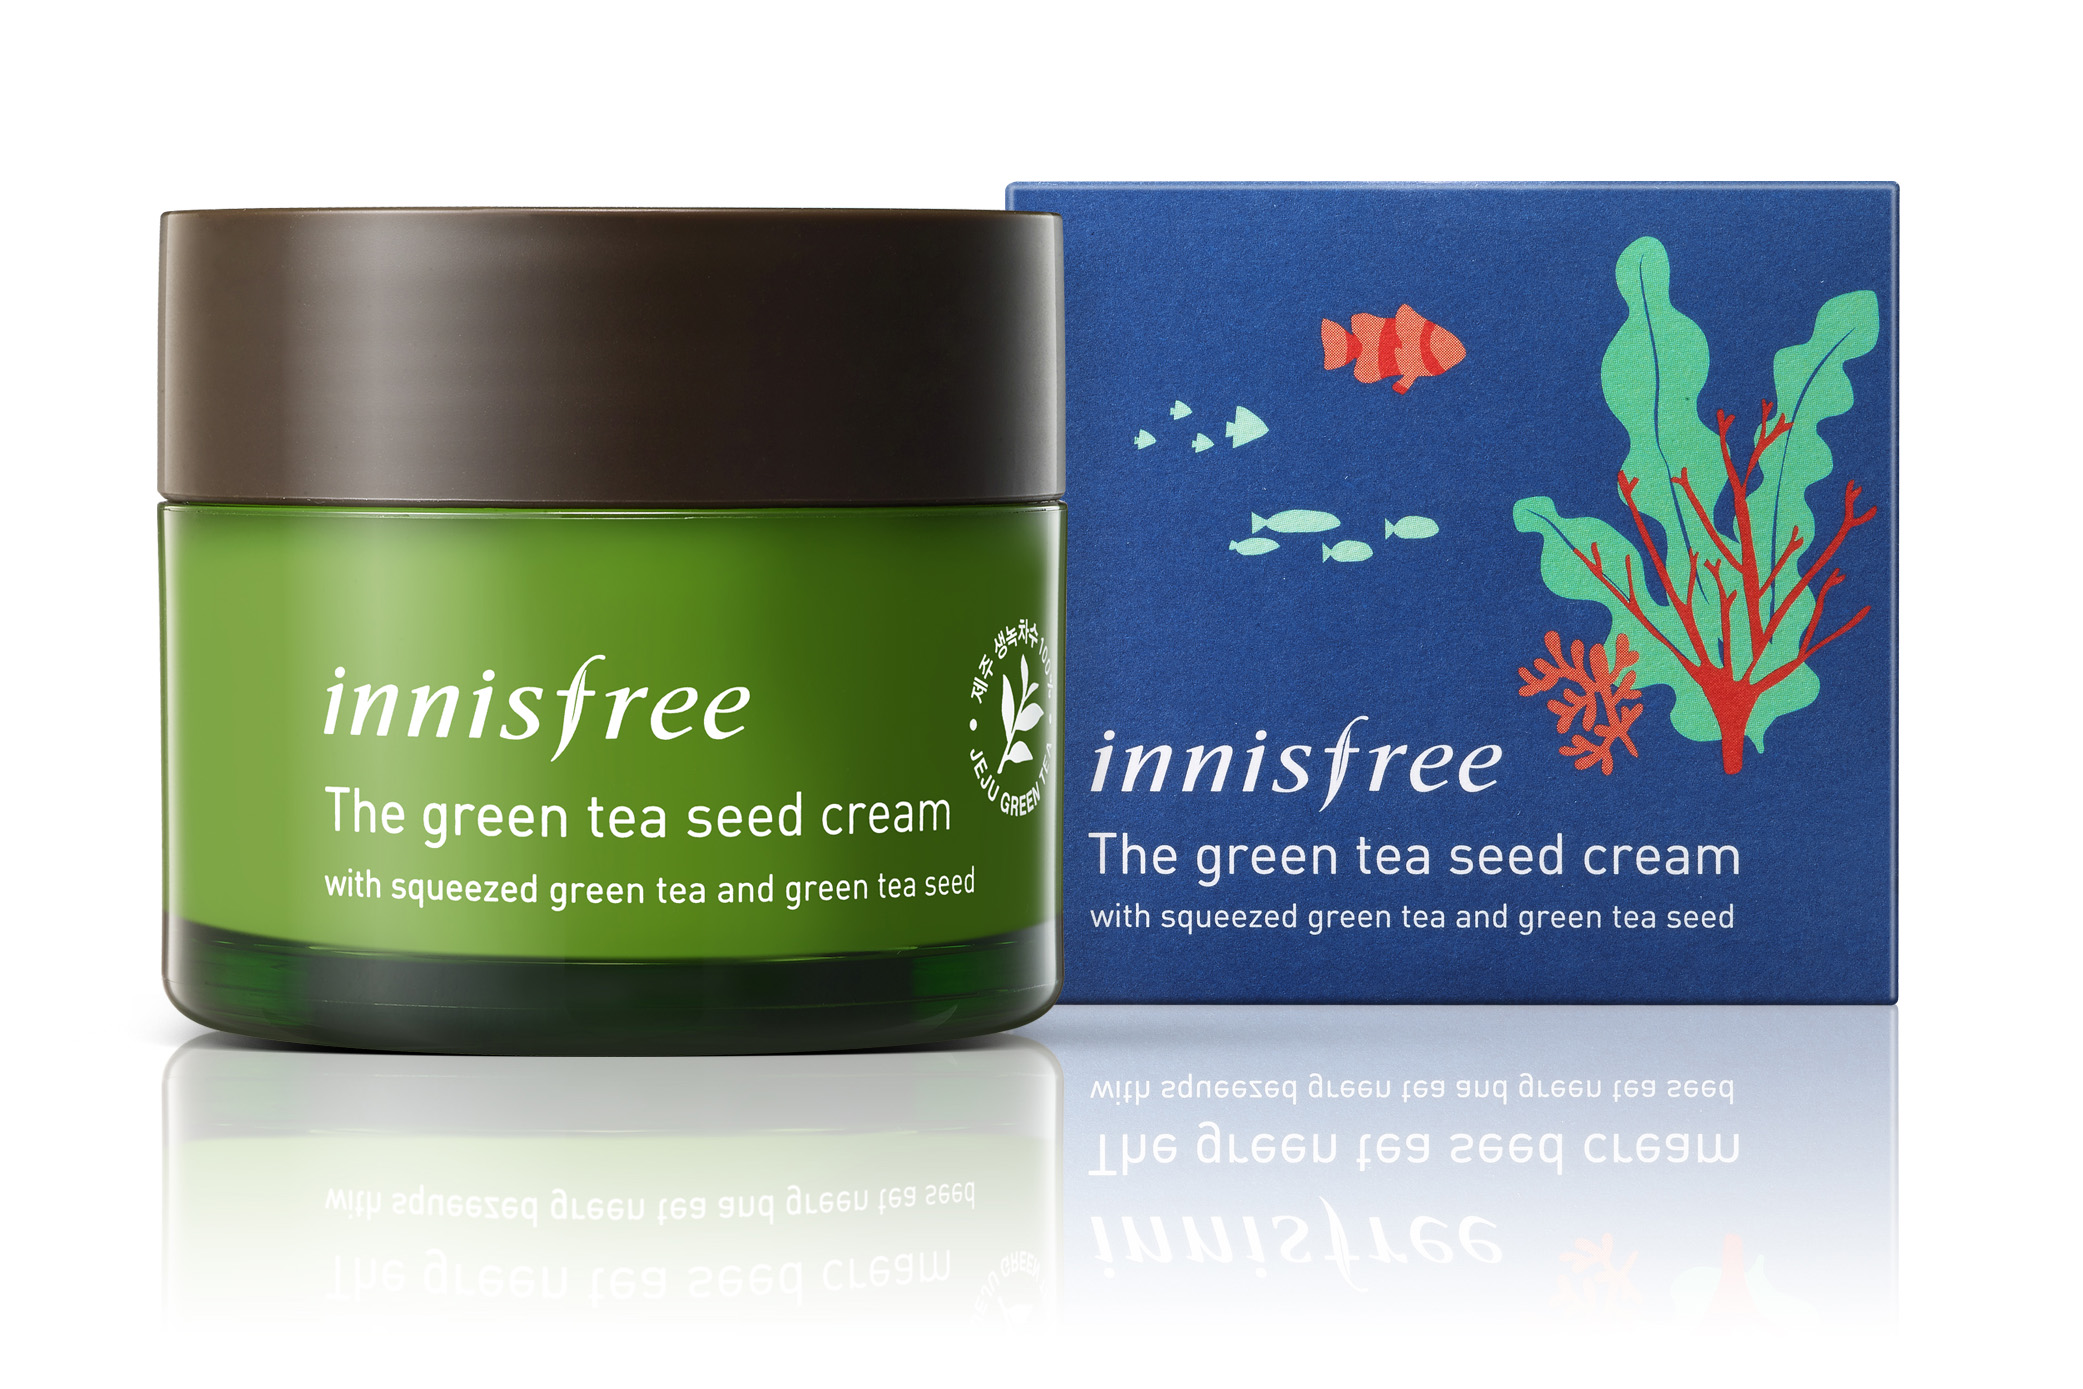 The green tea seed cream (Limited edition Eca-Hankie campaign)